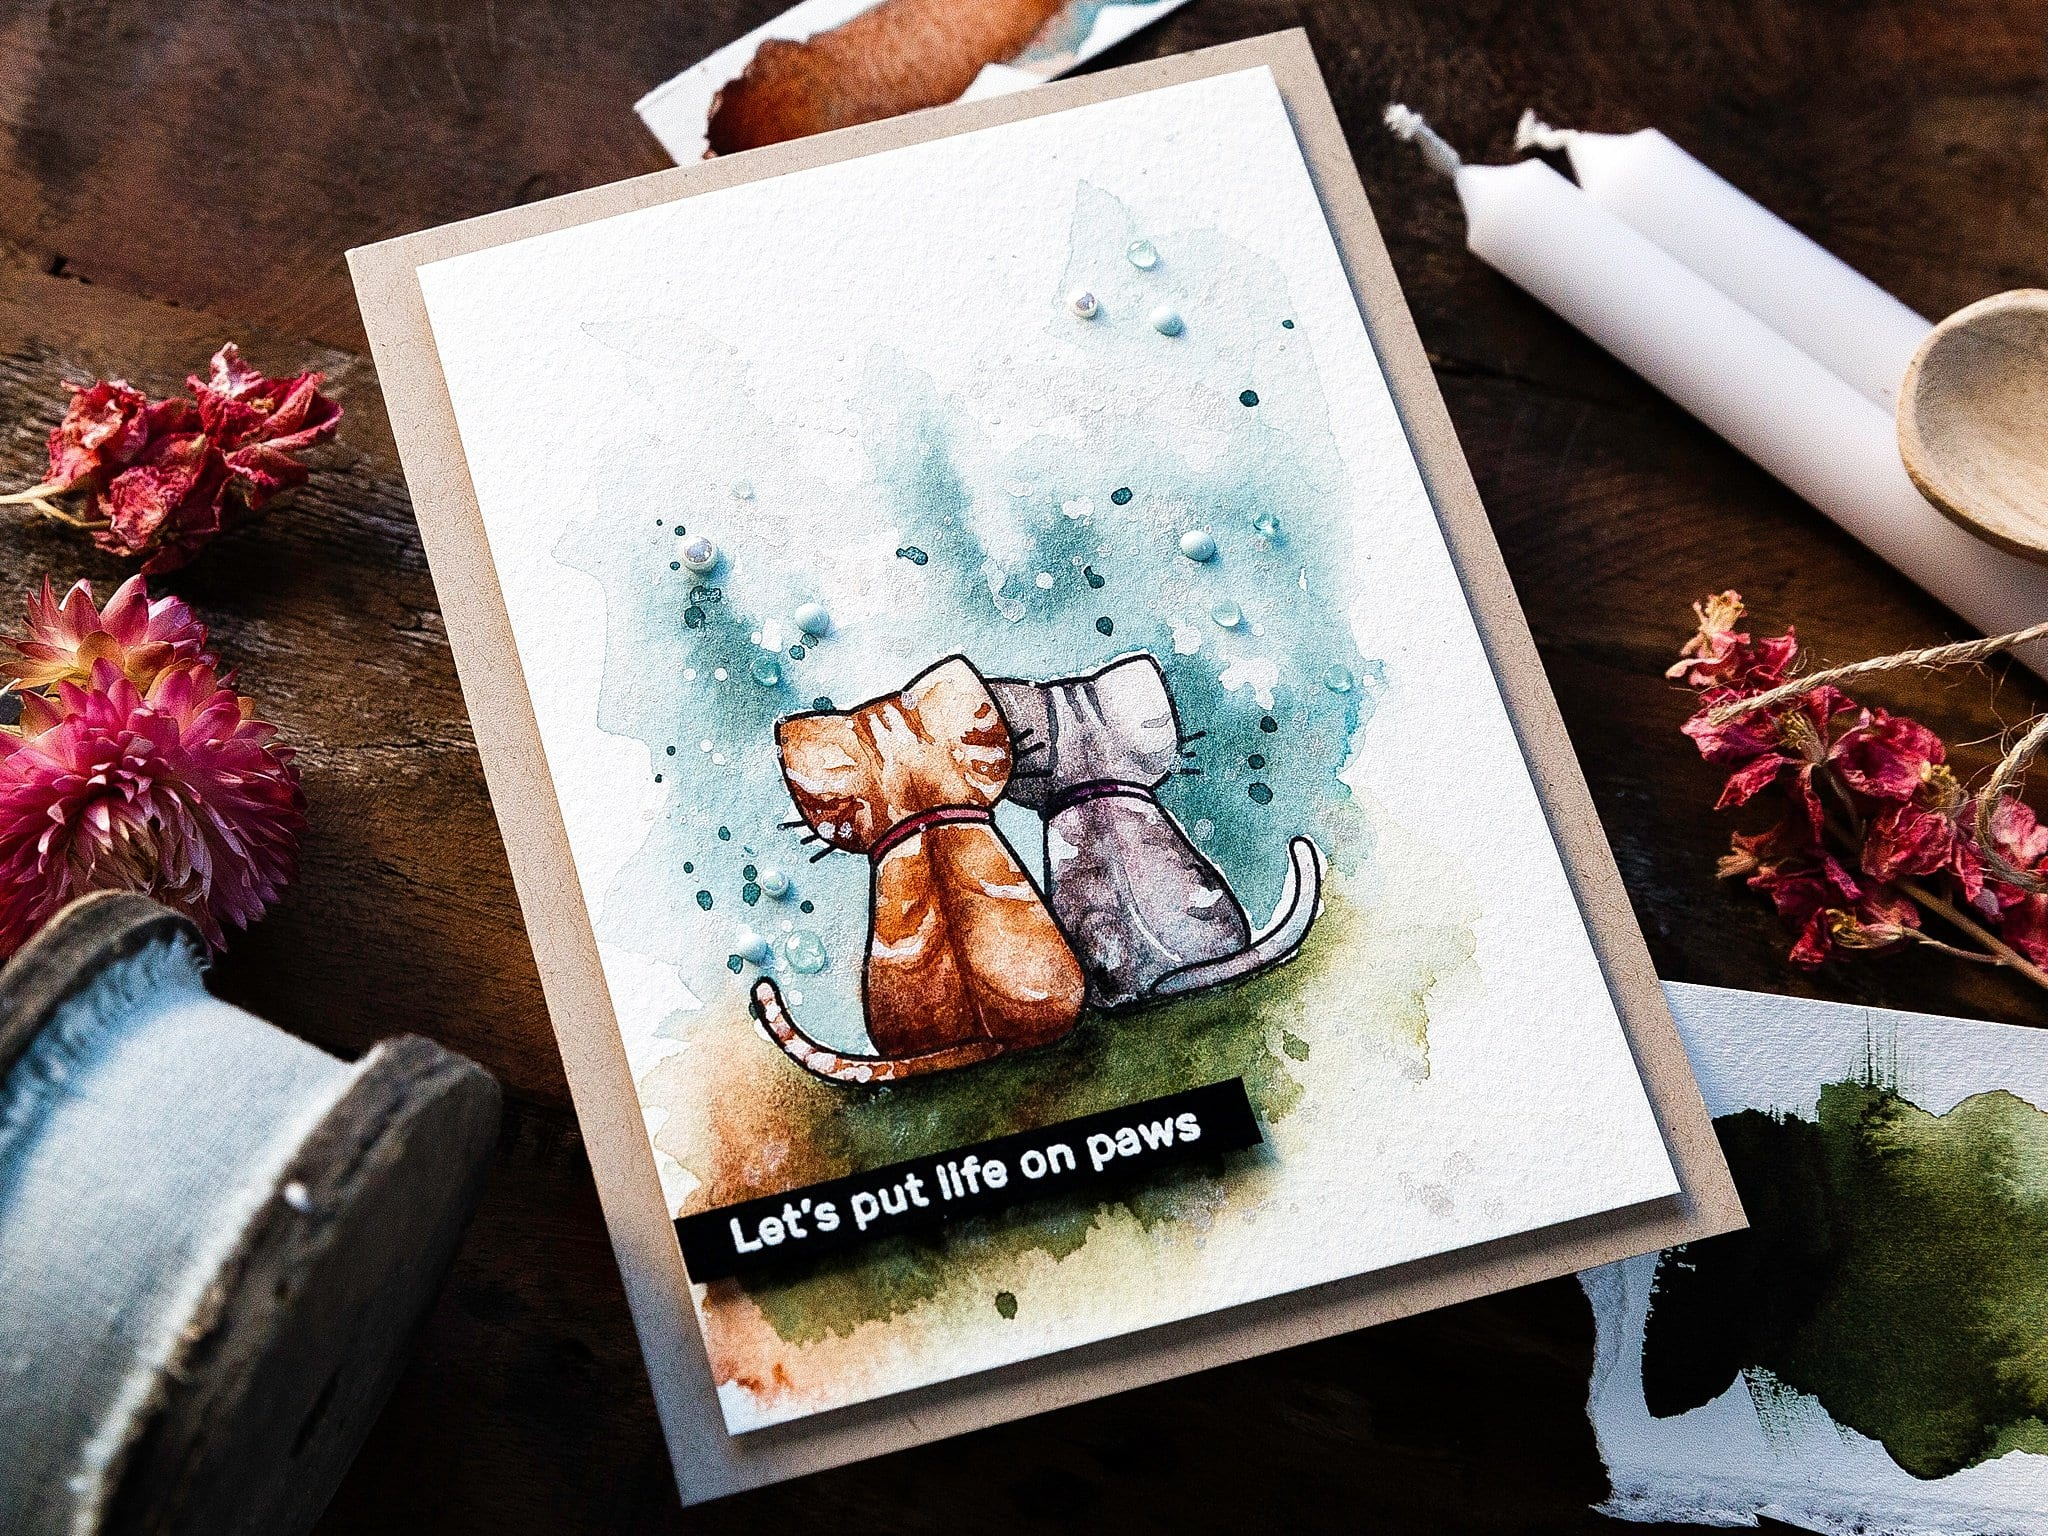 Video tutorial - watercoloured simple scene. Handmade card by Debby Hughes #debbyhughes #limedoodledesign #handmadecards #cardmaking #cardmakingideas #cardmakingtechniques  #cardmakingtutorials #handmadecardideas #simonsaysstamp